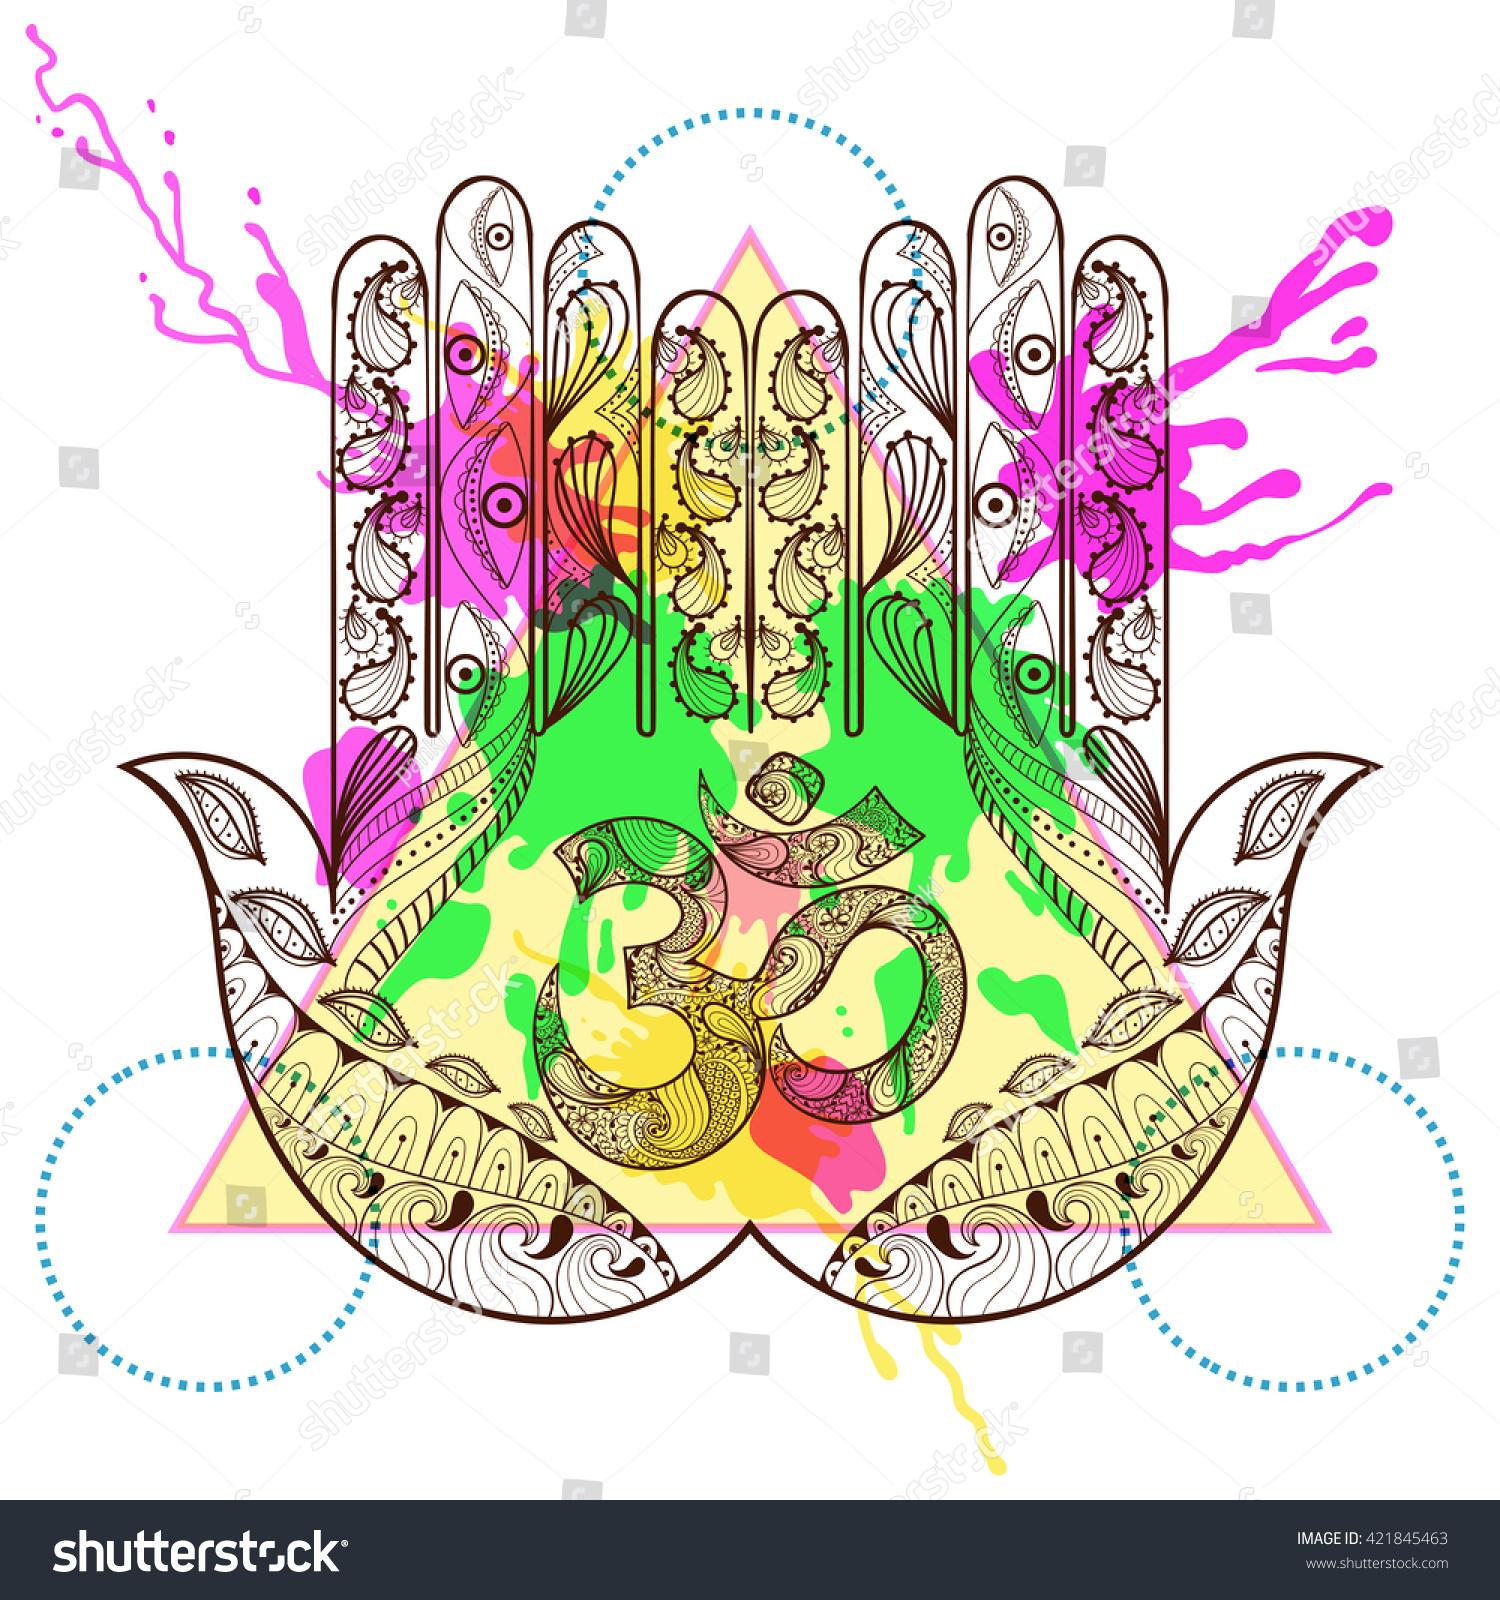 Hand drawn protection hamsa hand symbol stock illustration hand drawn protection hamsa hand with symbol ohm in zentangle henna tattoo style hamsa biocorpaavc